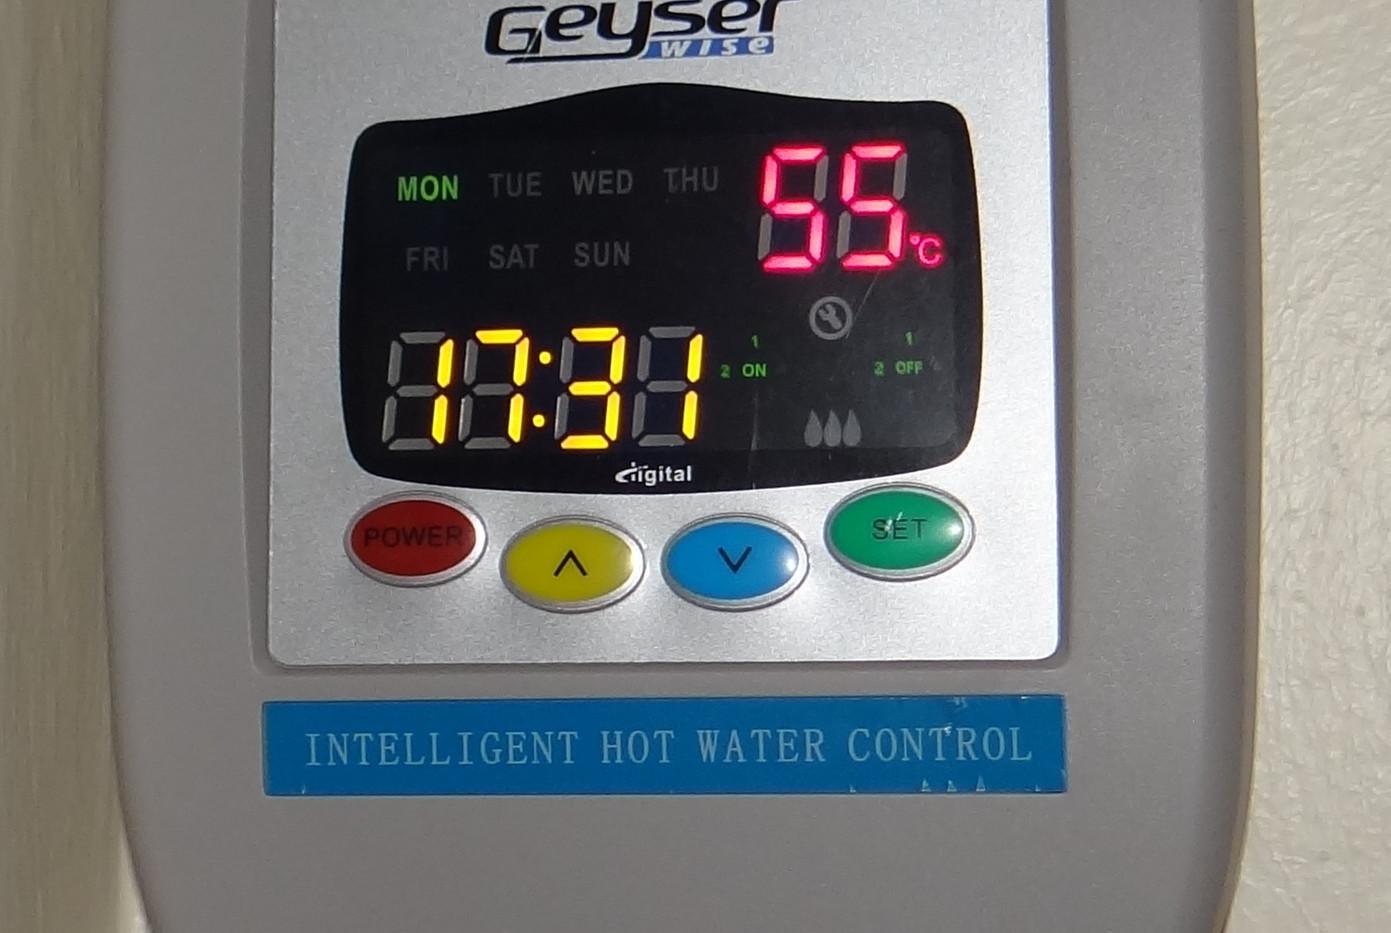 Geyserwis Controller.jpg